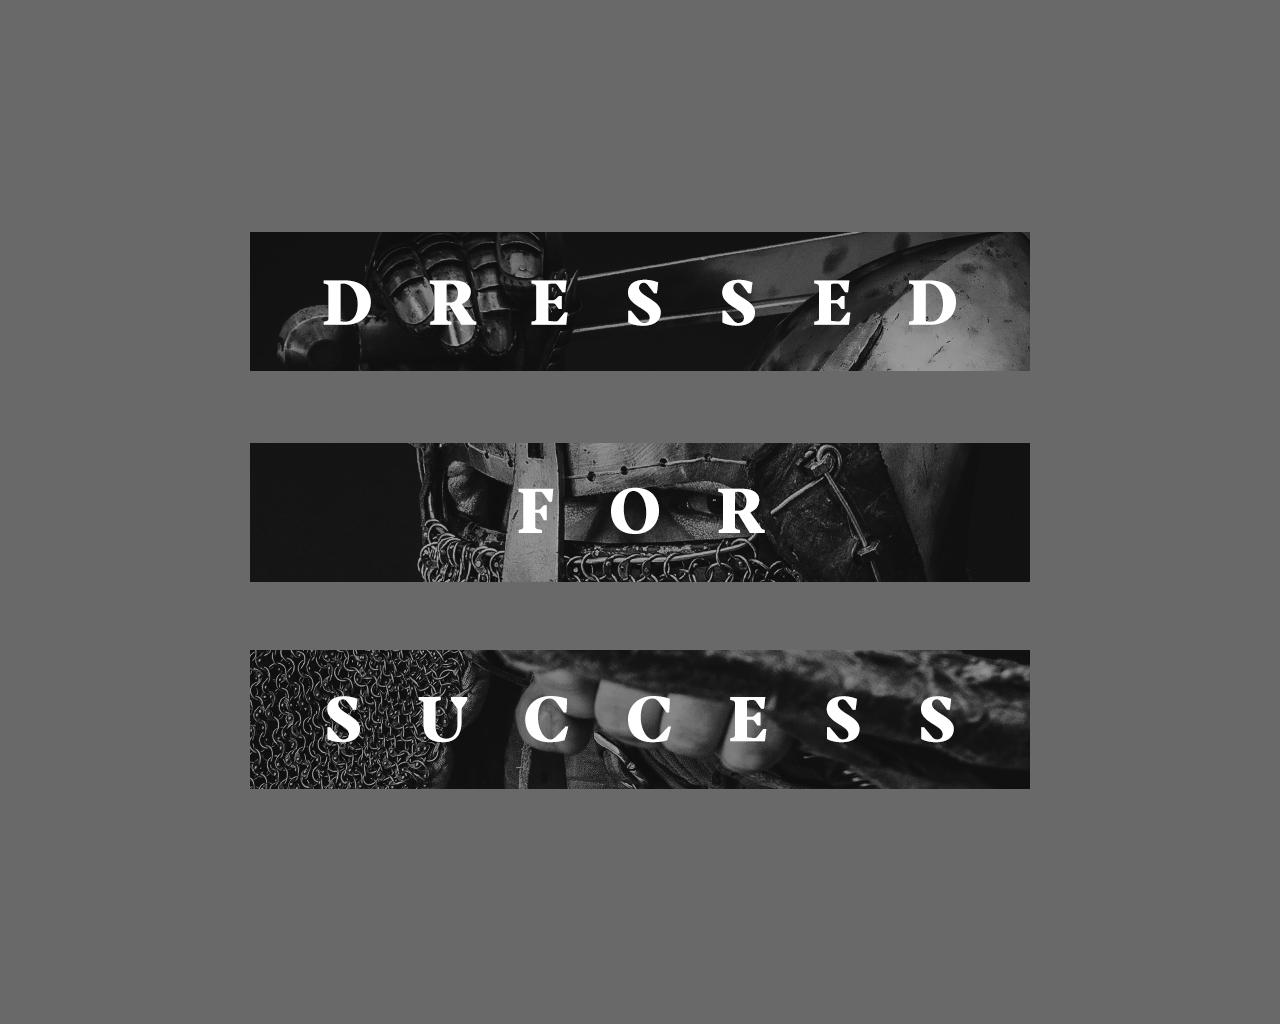 DressedForSuccess2.jpg